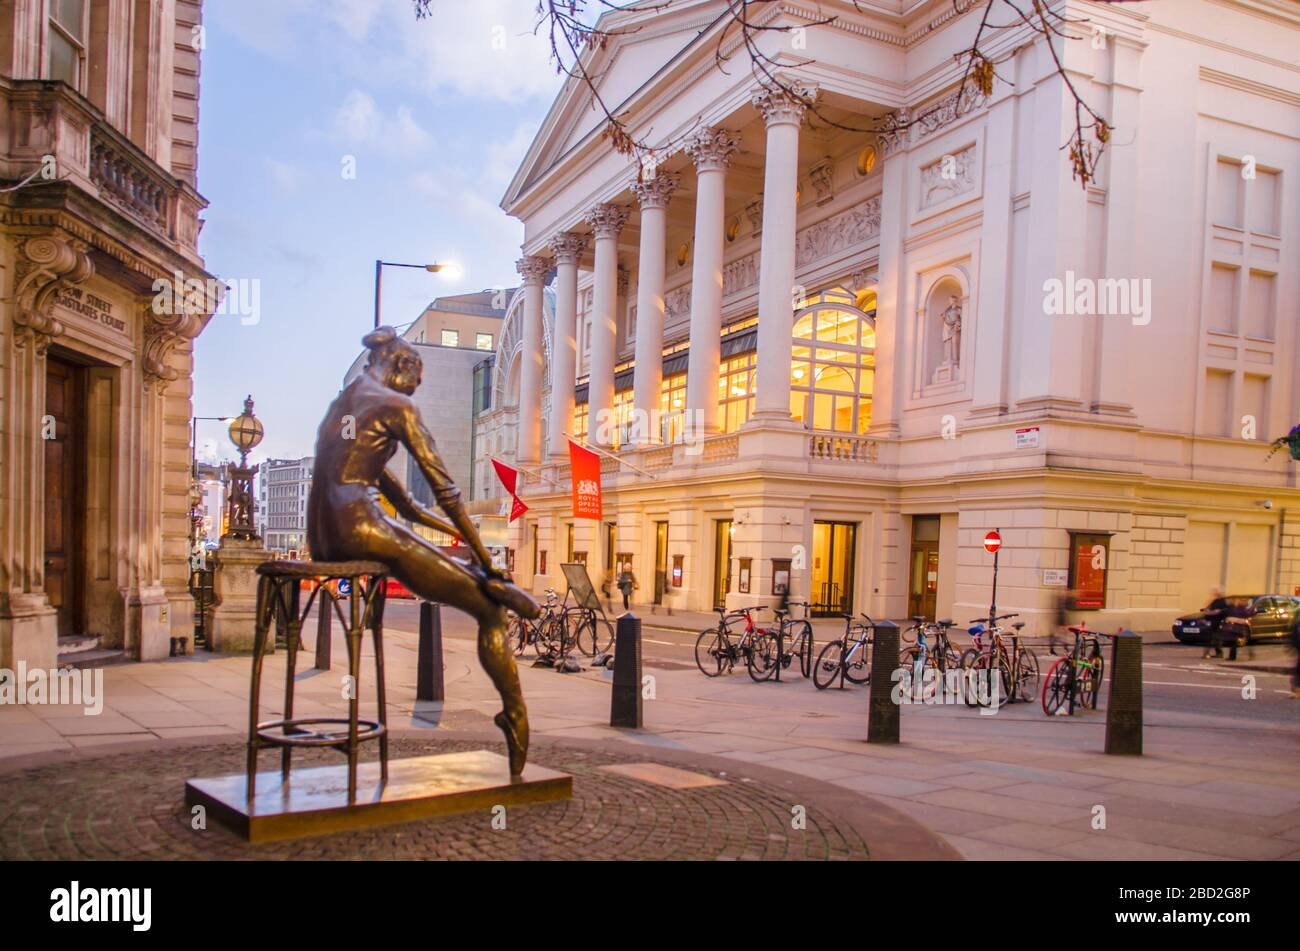 The Royal Opera House, Covent Garden, London UK Stock Photo